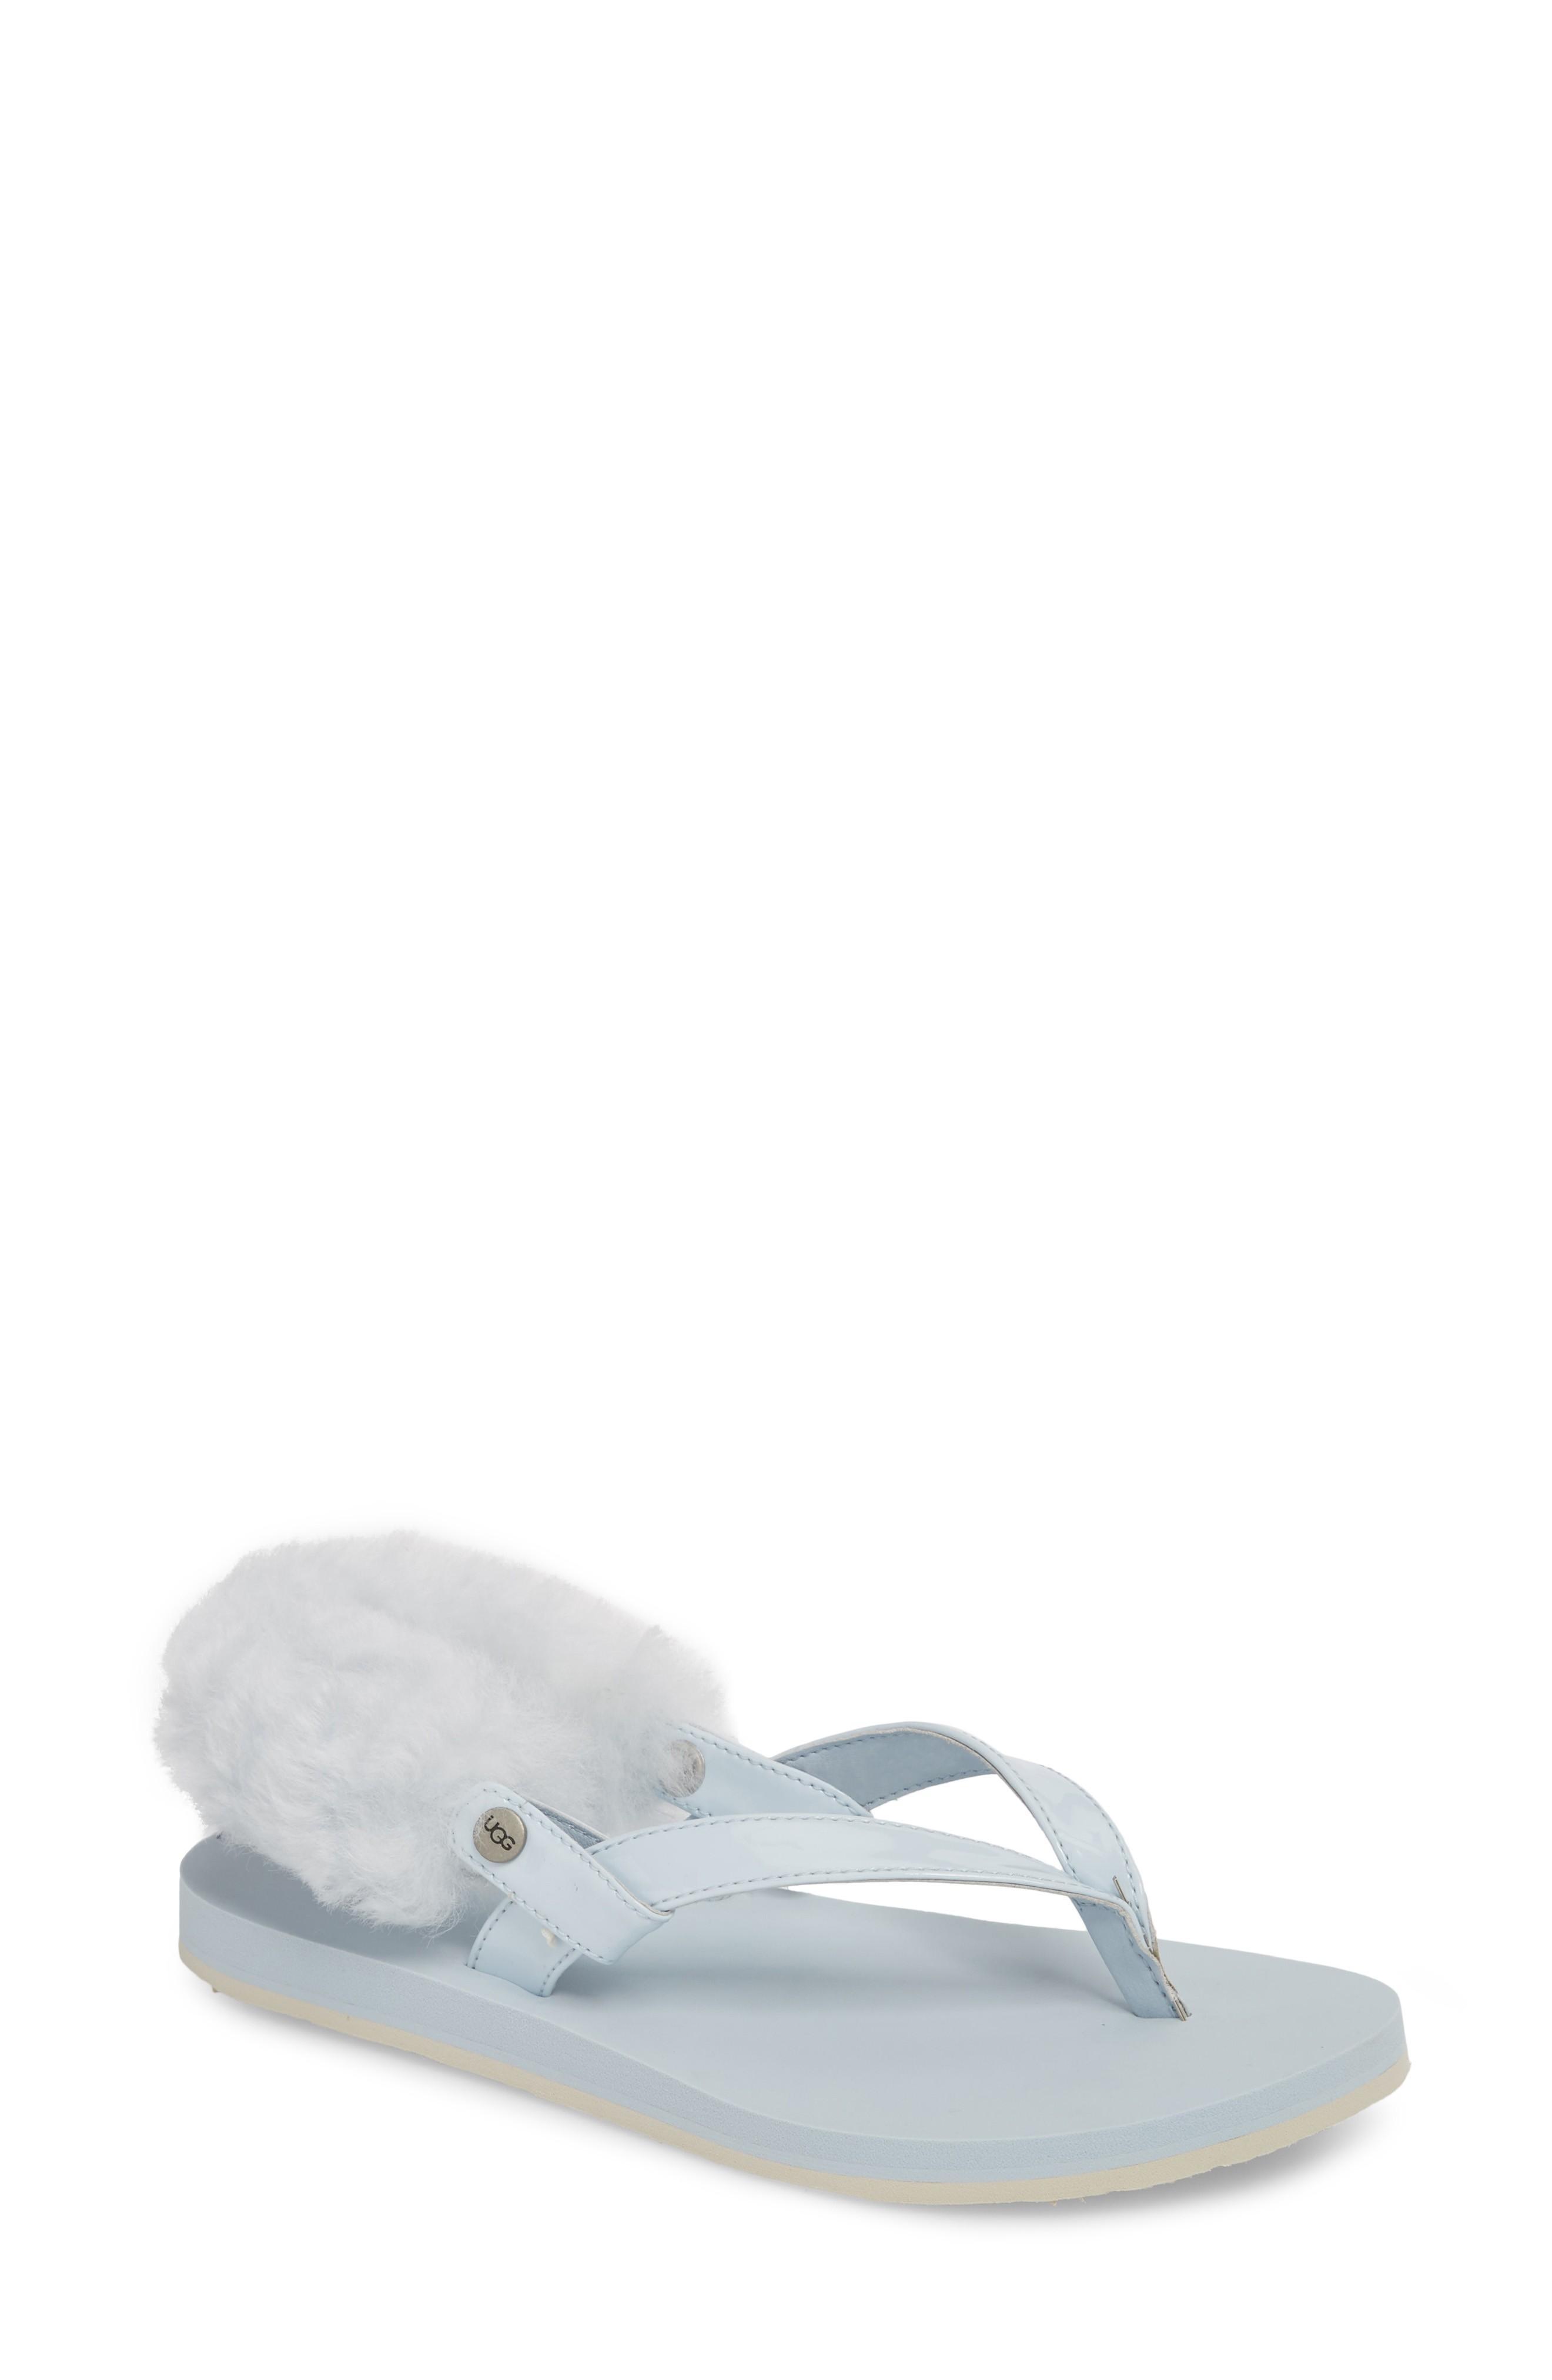 1476a33db8b Ugg Laalaa Sandal in Sky Blue